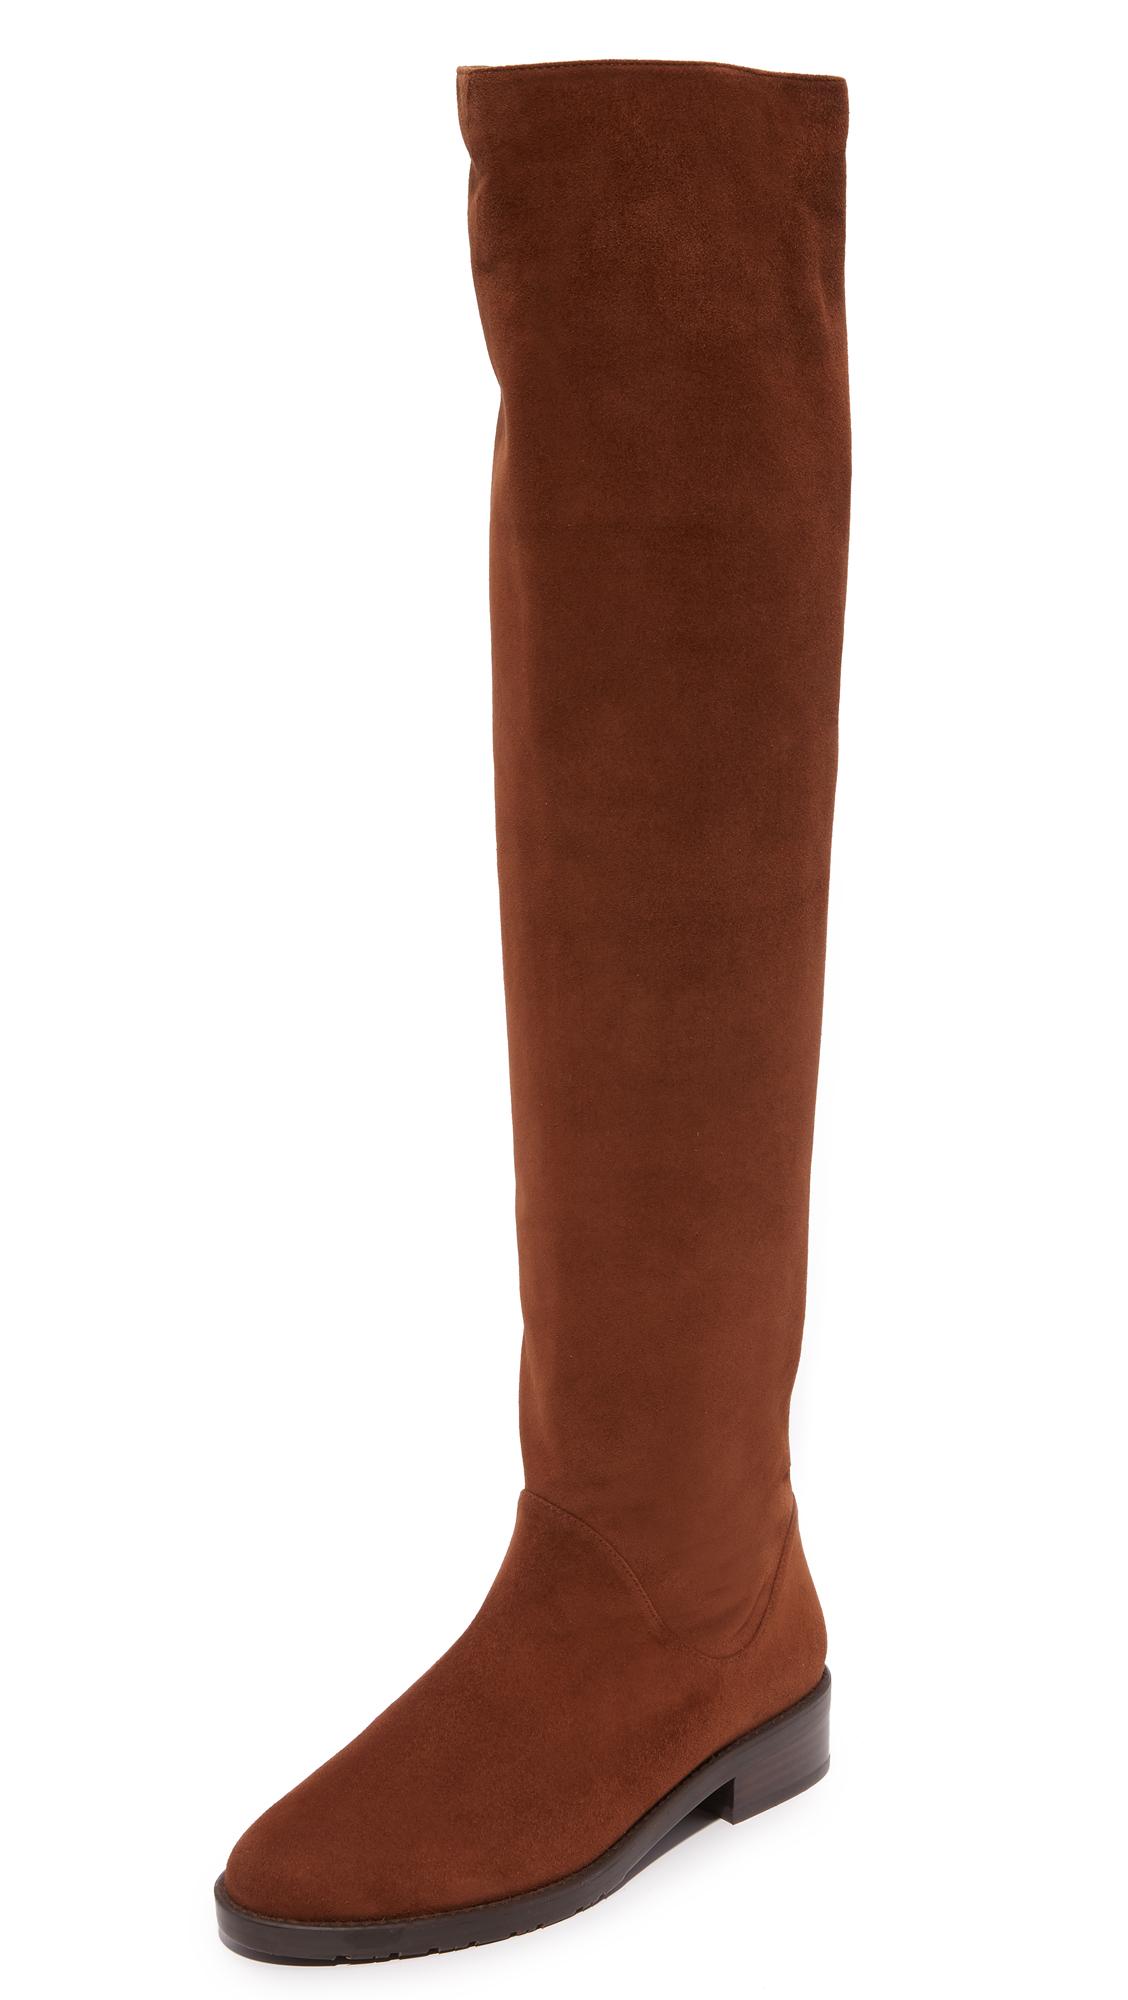 Stuart Weitzman Rockerchic Boots - Walnut